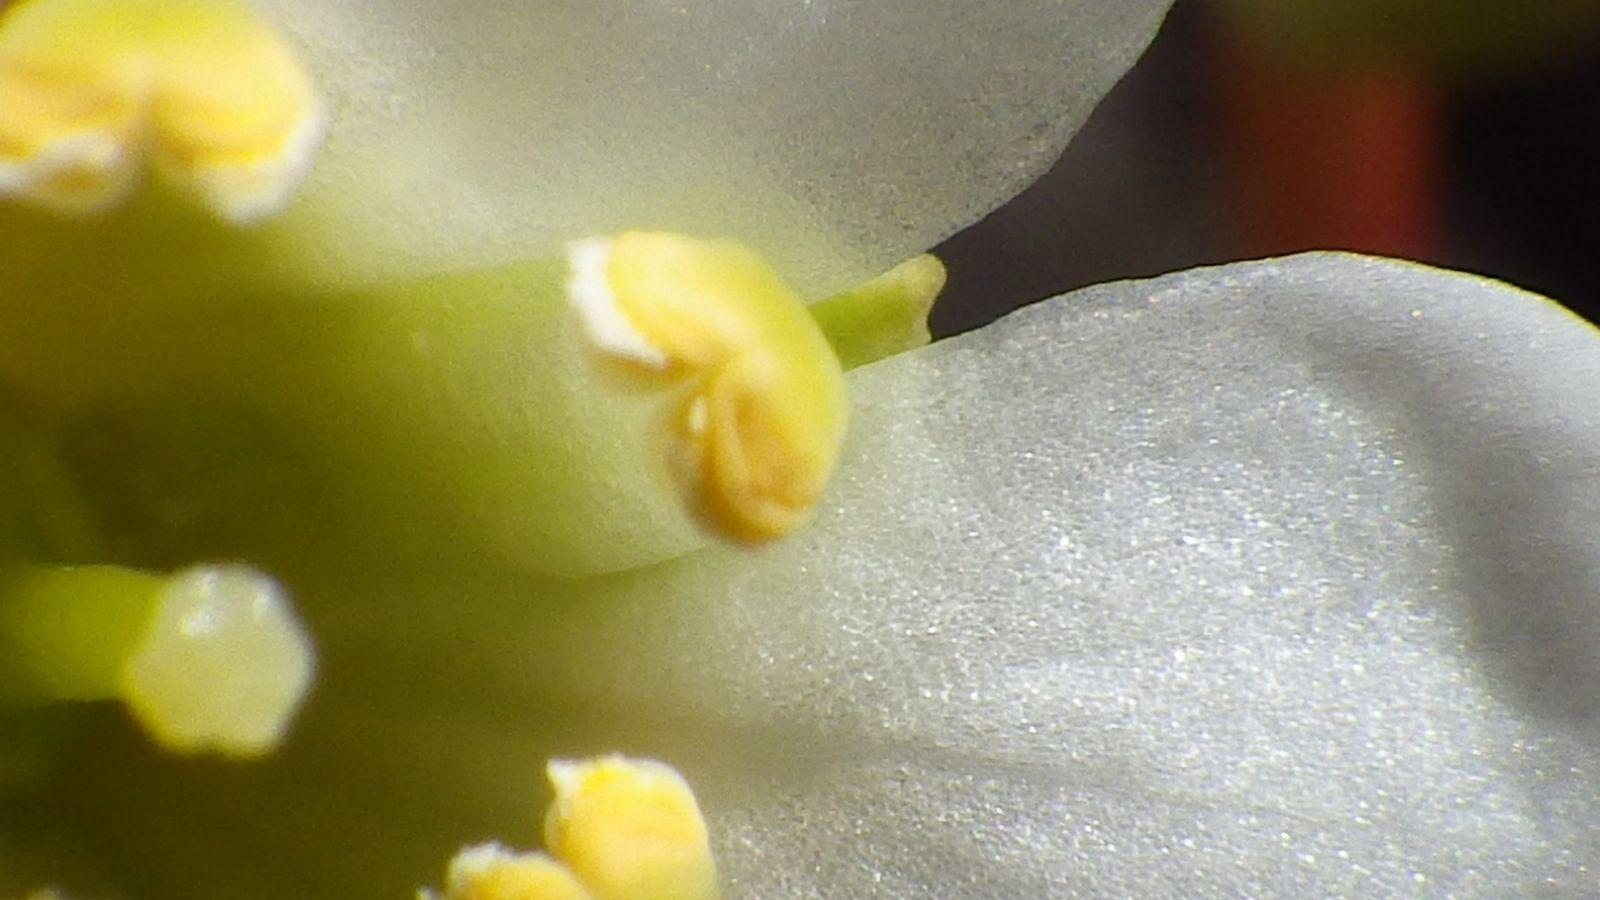 2014-06-23-1320_-_Gode_1_Vegetation_3